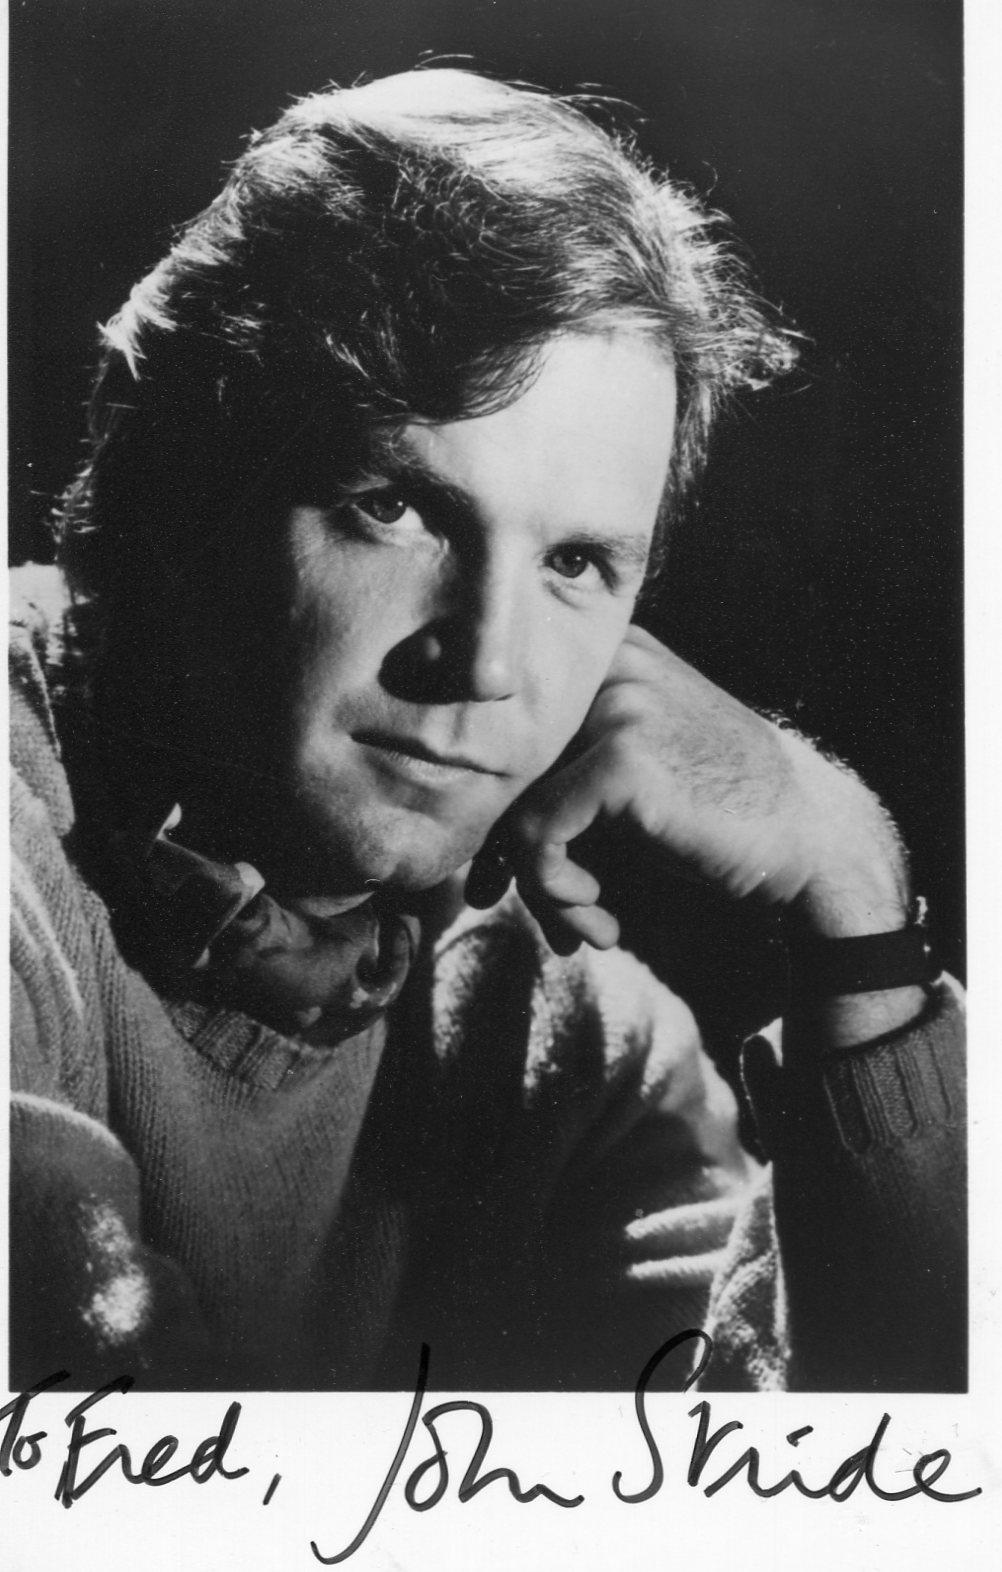 John Stride (born 1936)